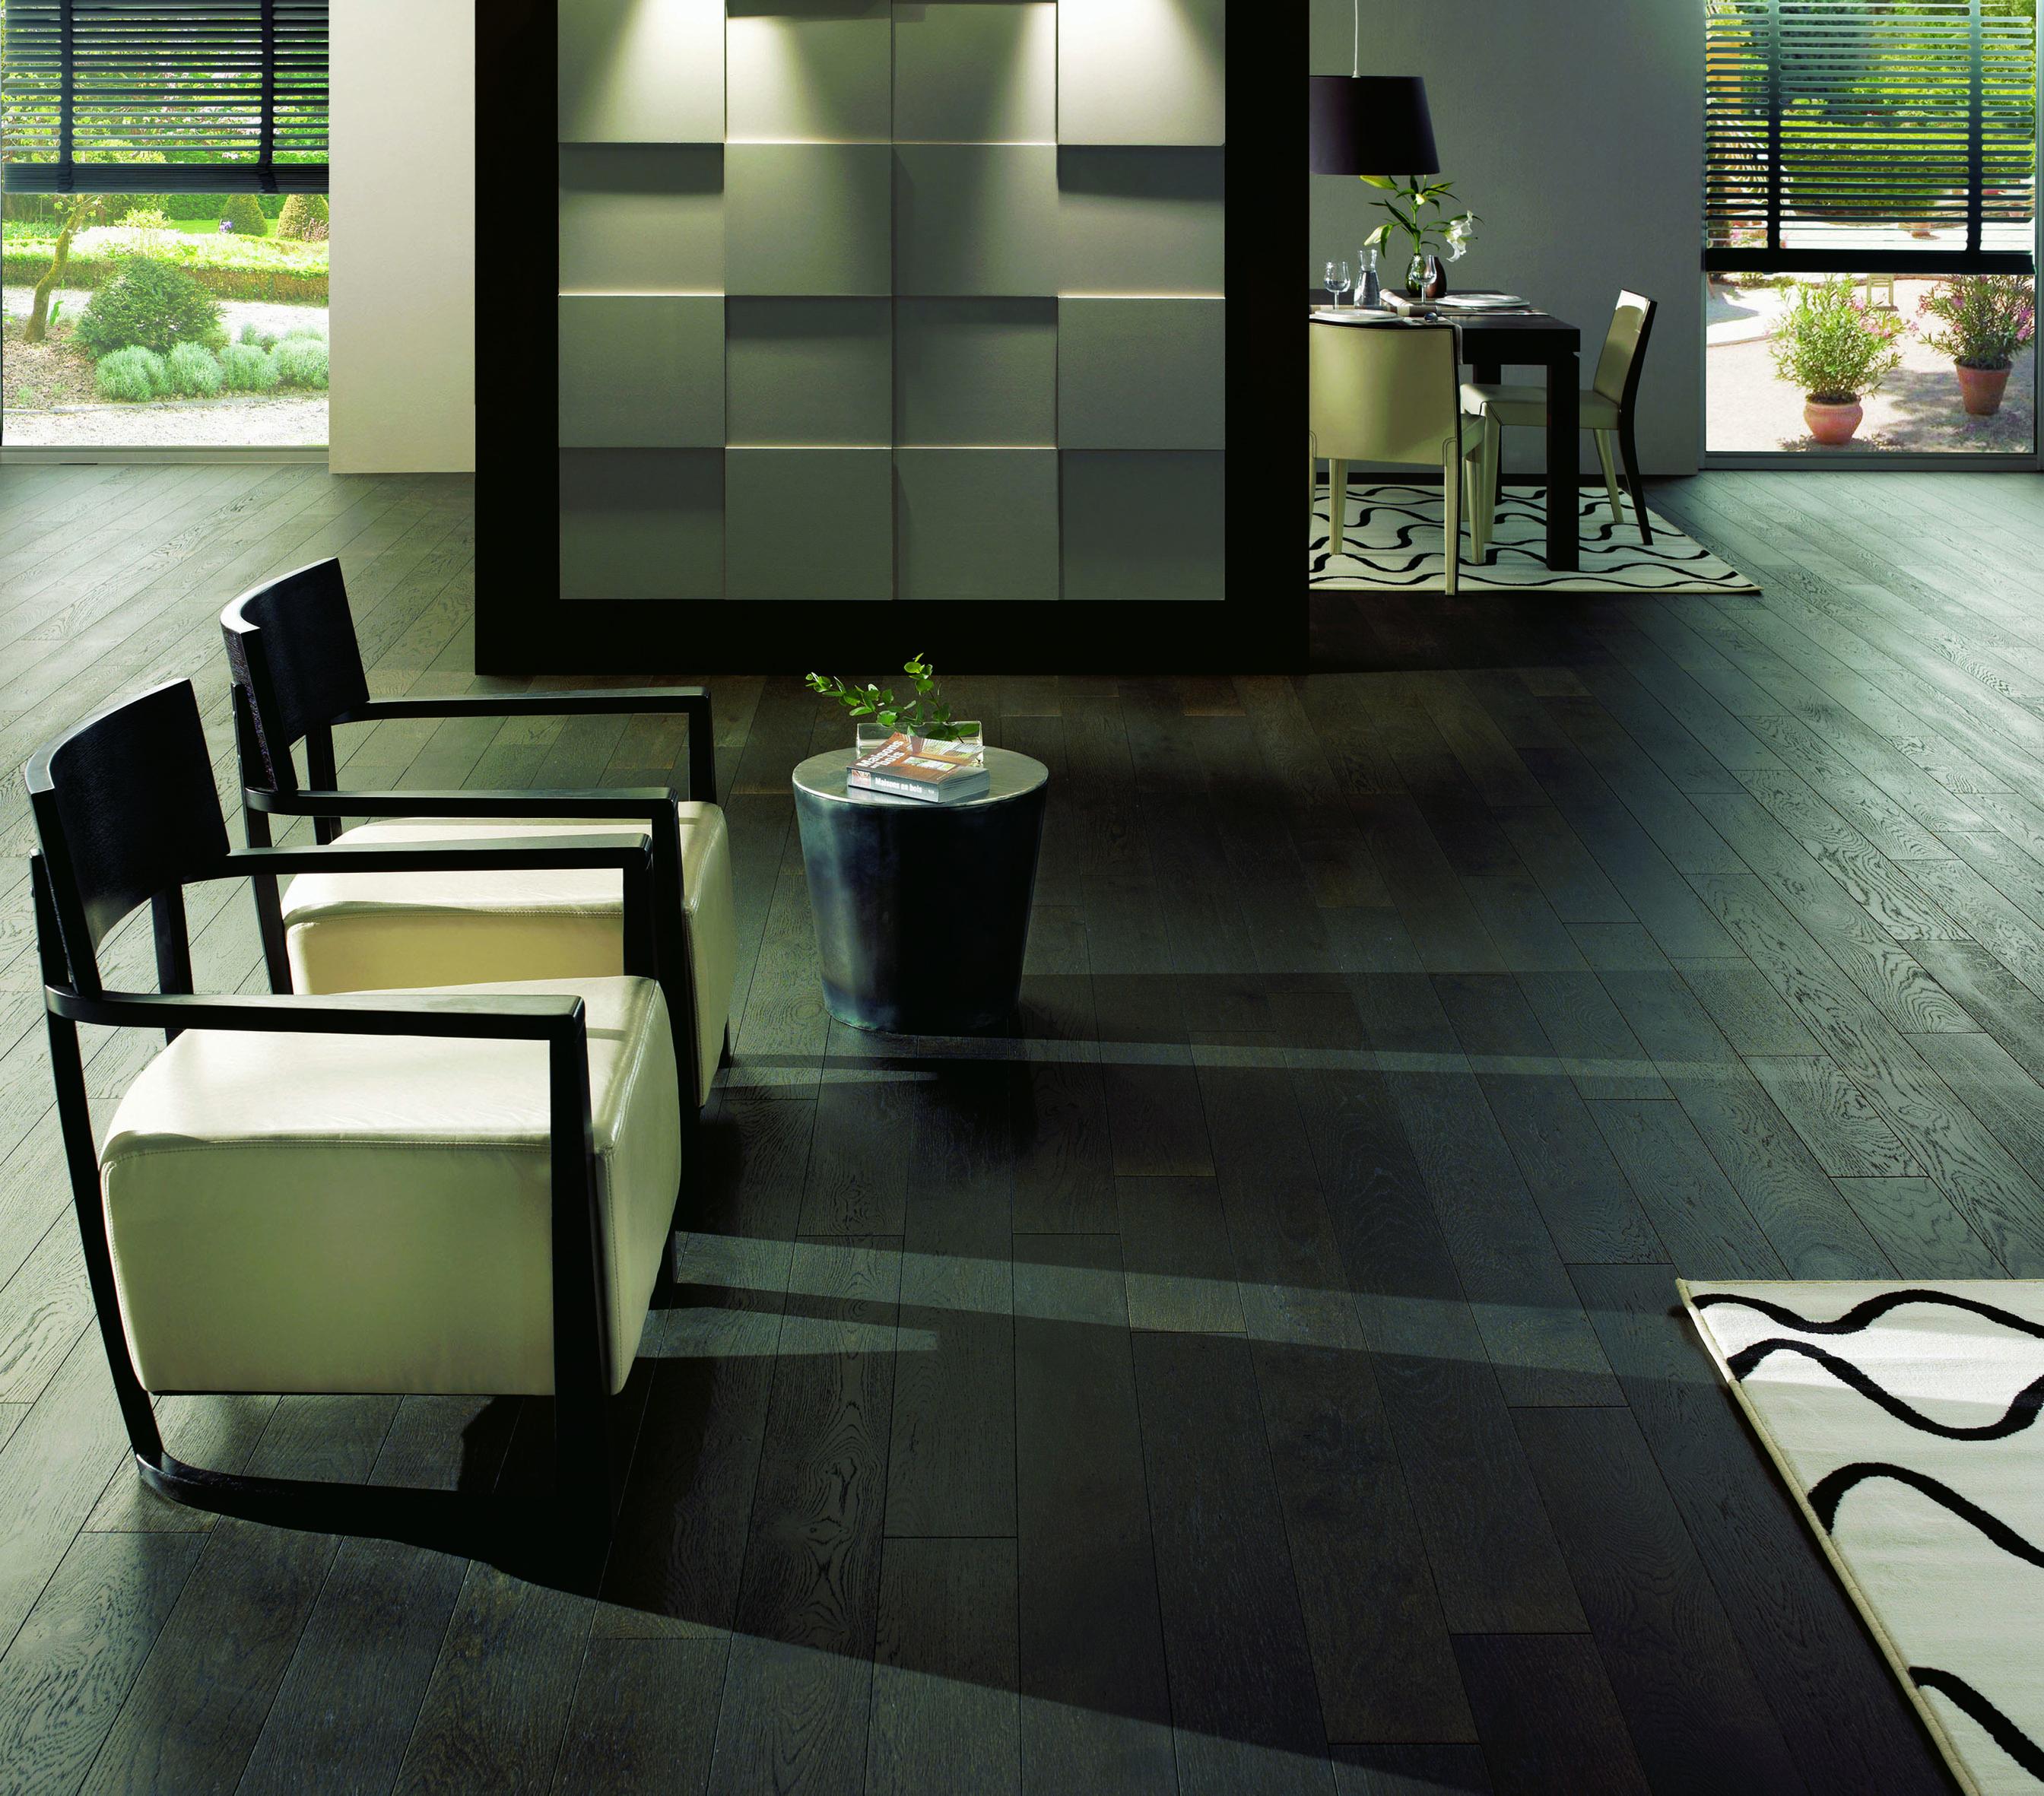 parquet contrecoll panaget diva 184 r l ch ne z nitude tourbe huil hue socoda n goces bois. Black Bedroom Furniture Sets. Home Design Ideas